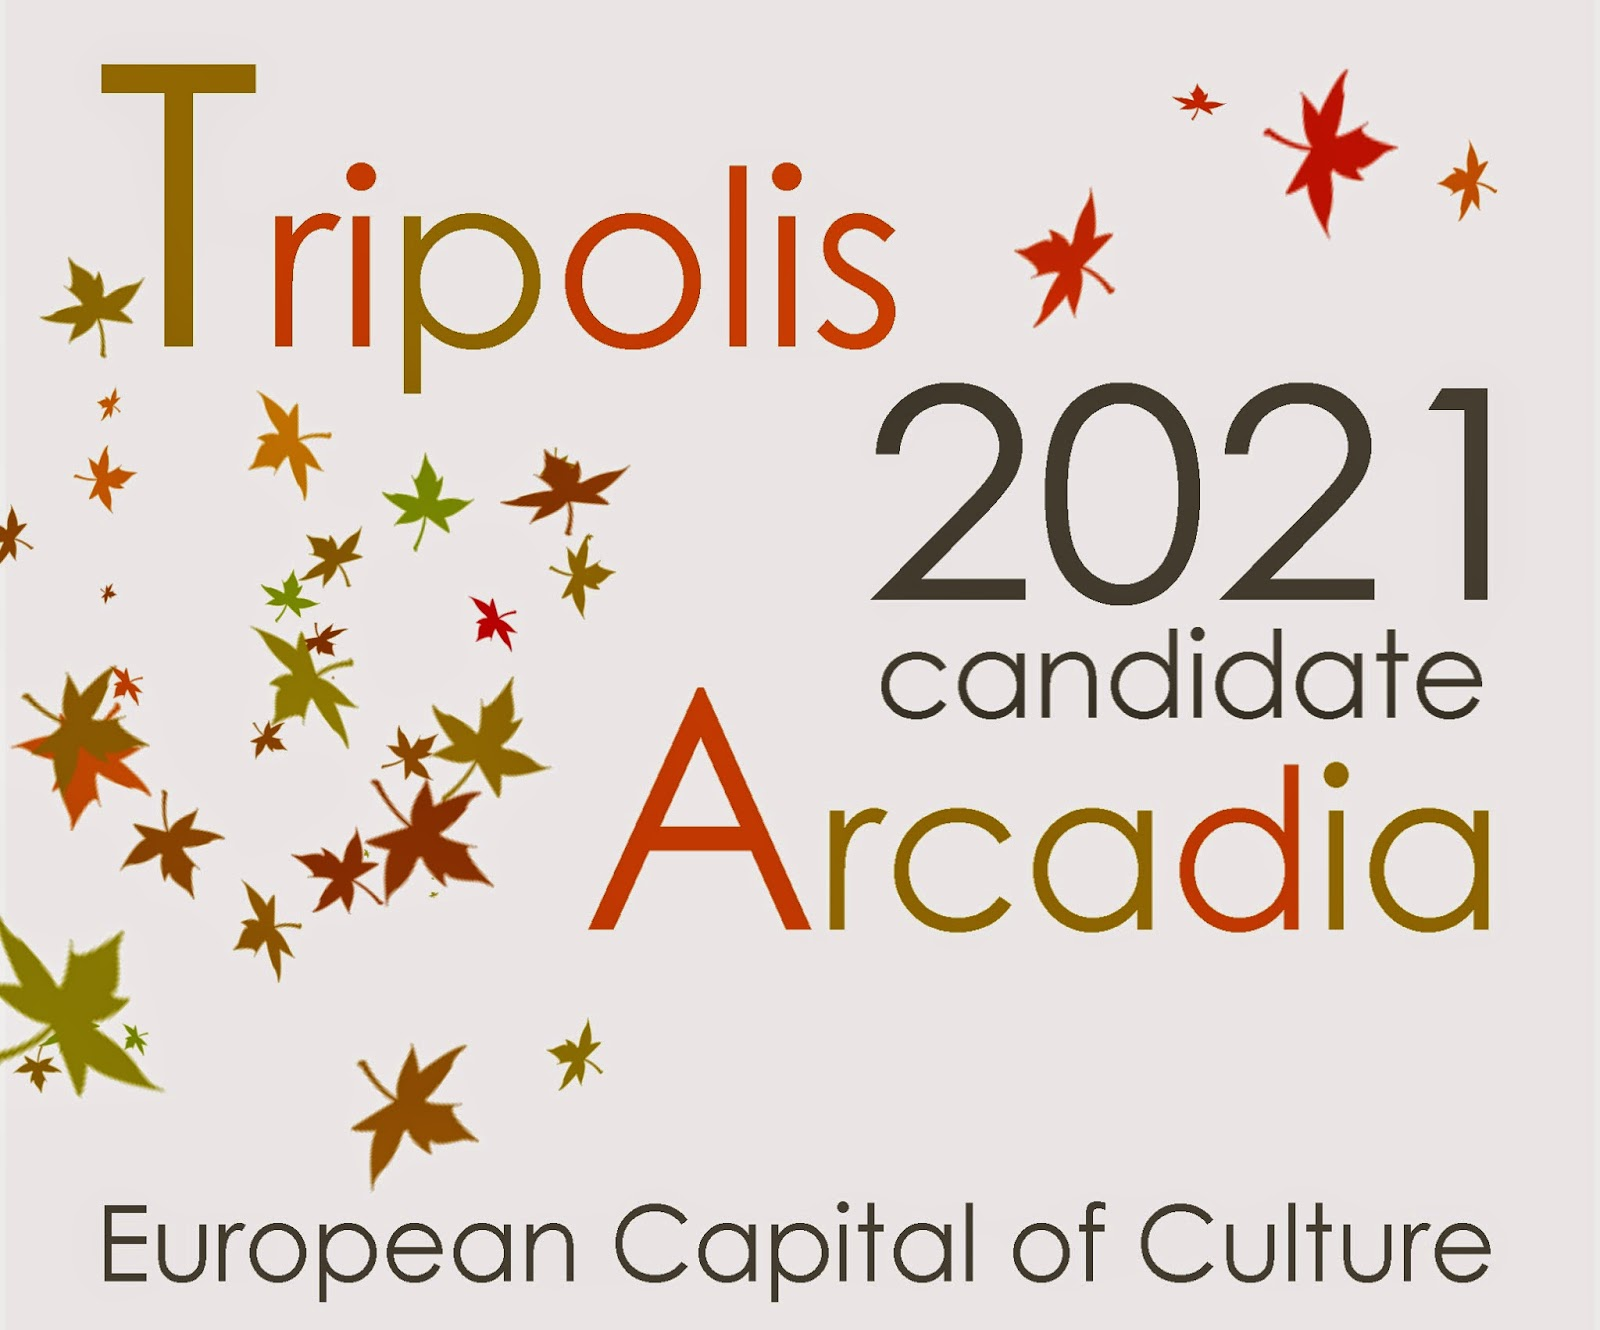 http://tripolisarcadia2021.gr/index.php/el/